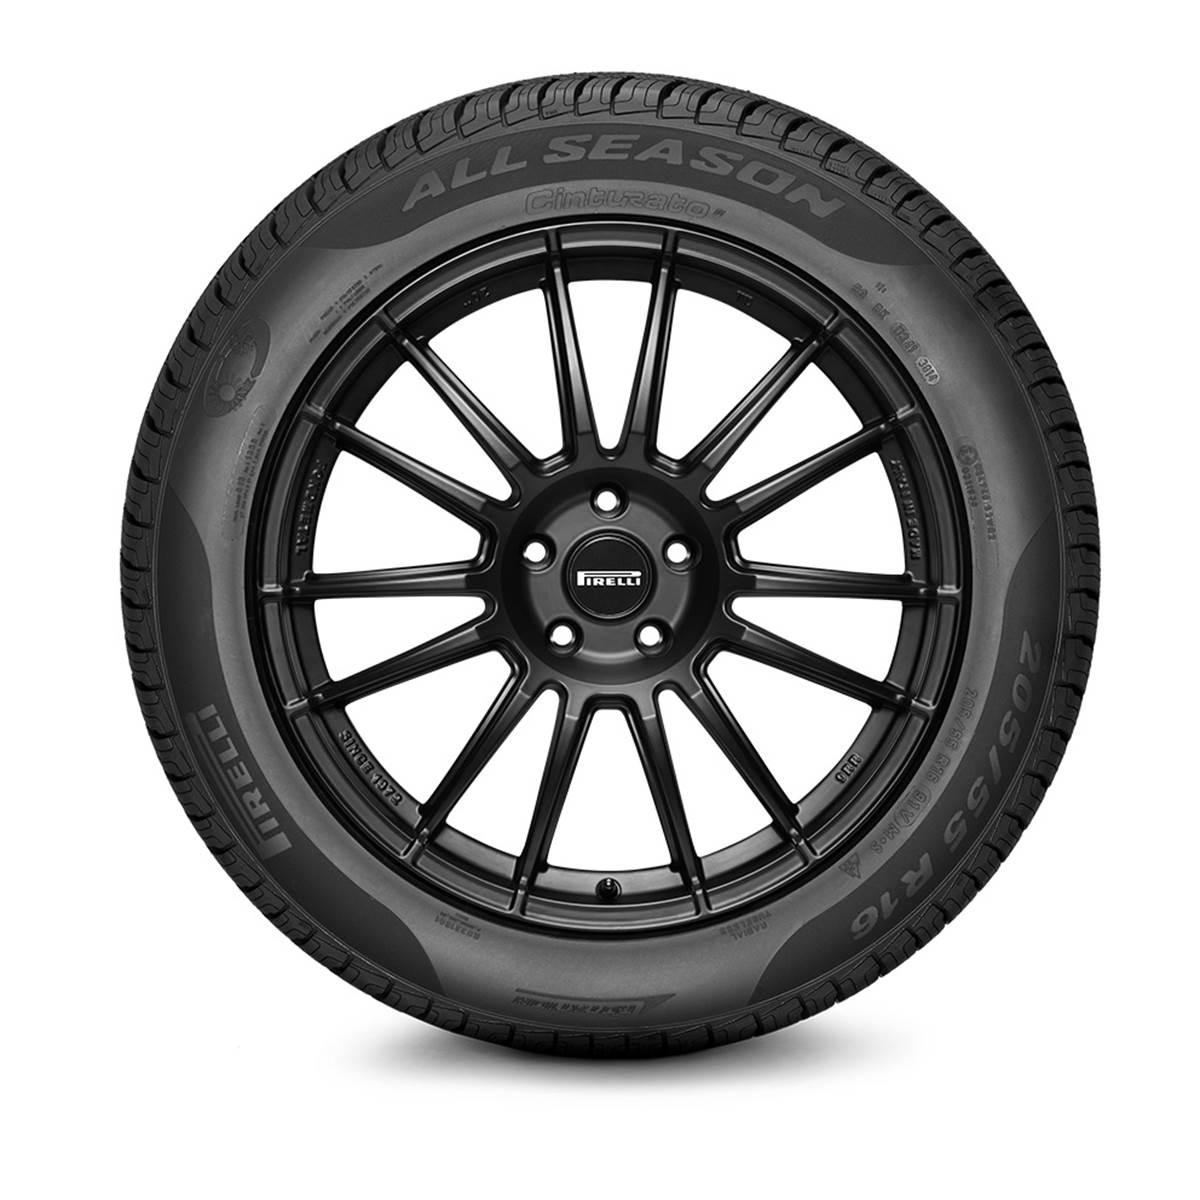 Pneu 4 Saisons Pirelli 195/65R15 91V Cinturato All Season